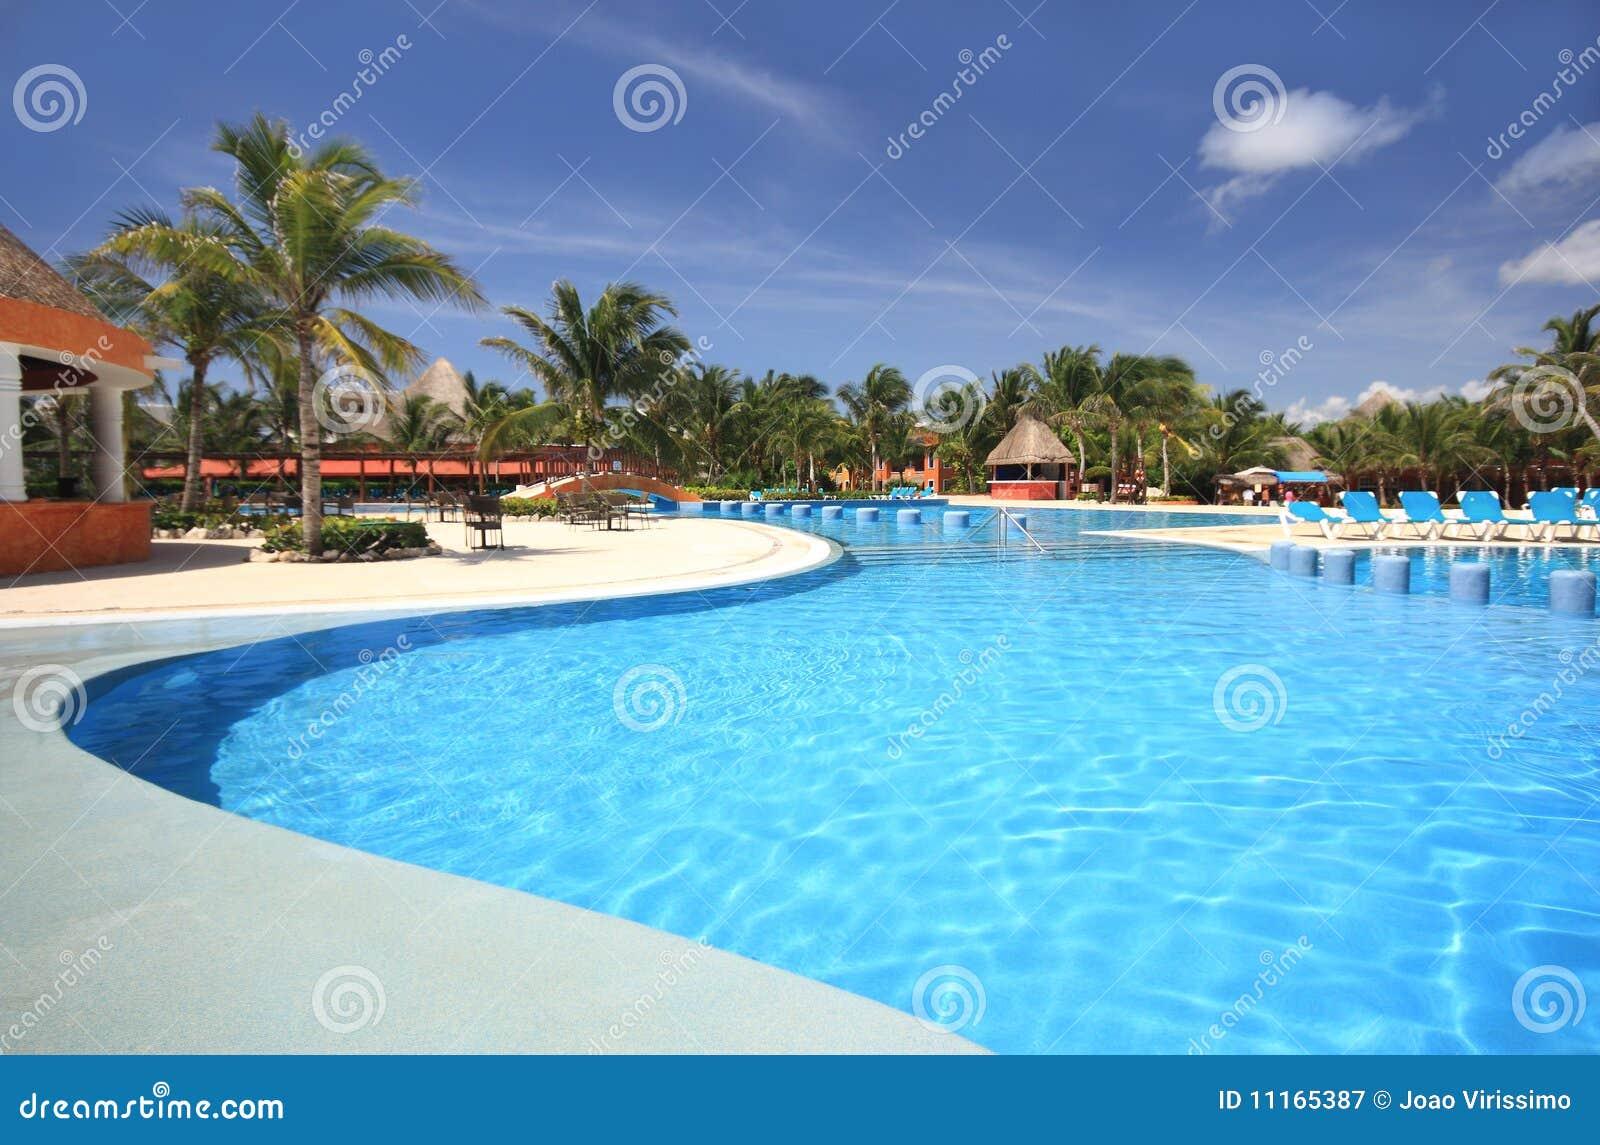 Strandurlaubsort-Swimmingpool